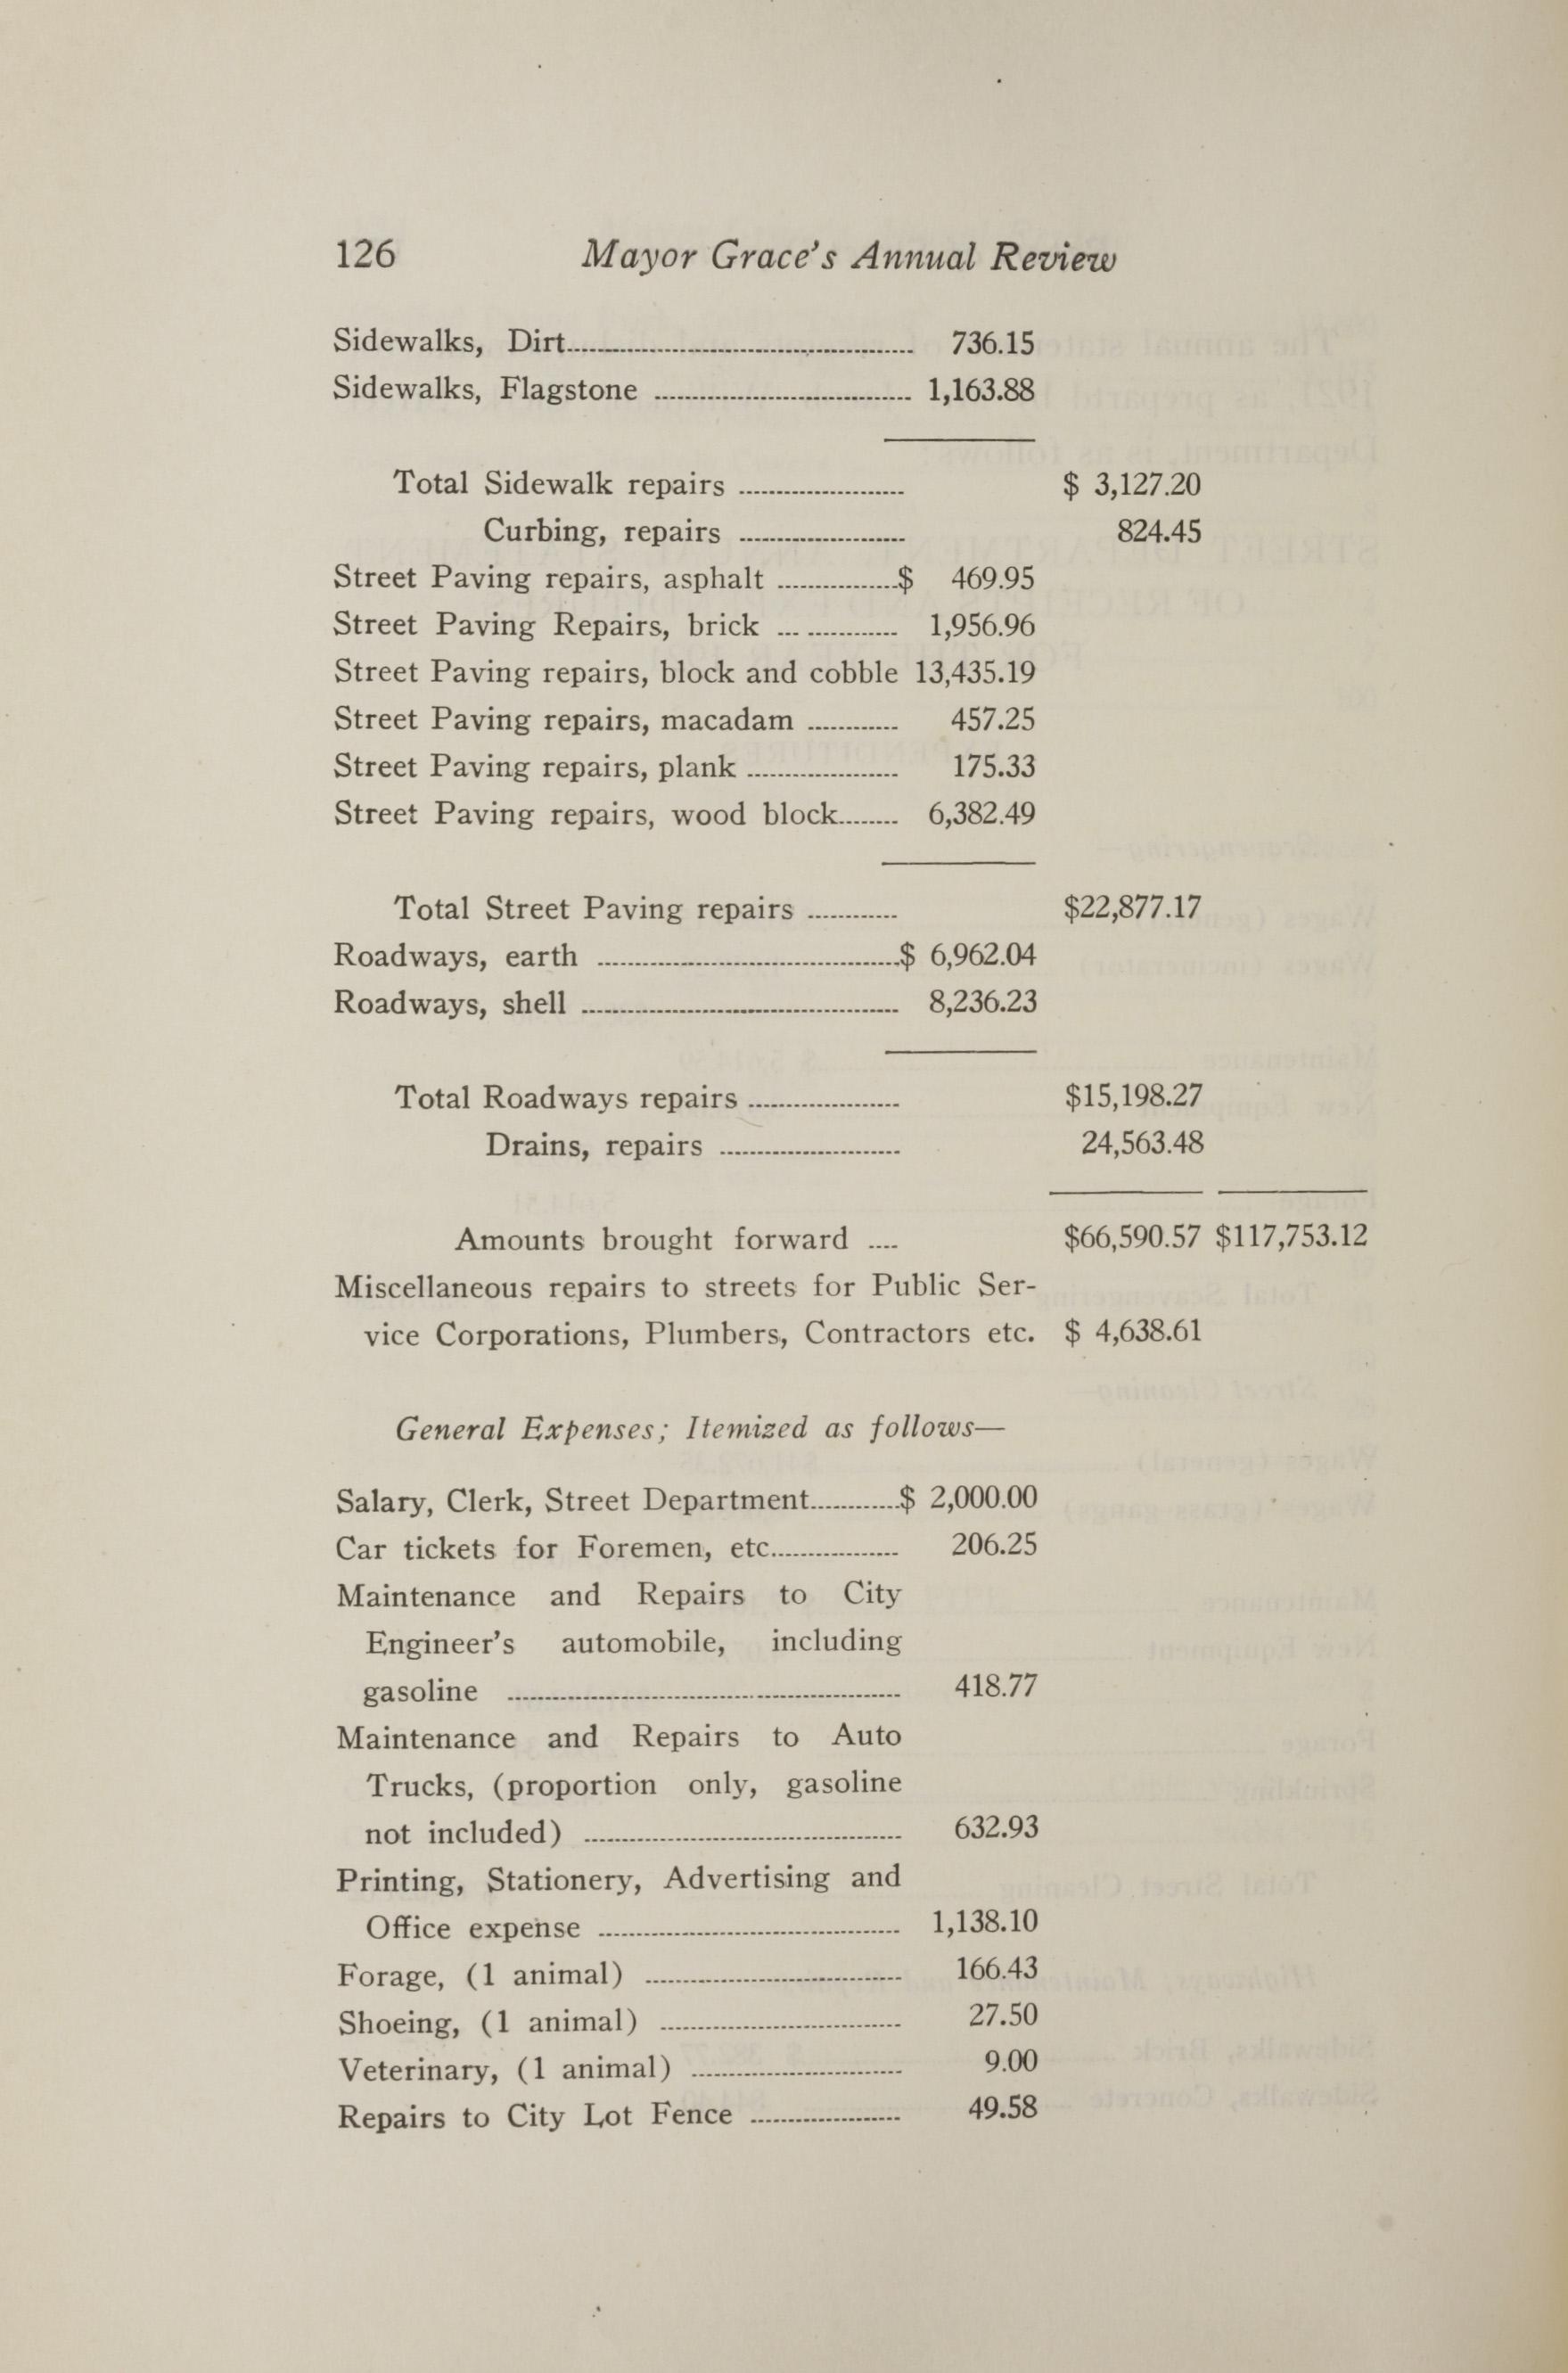 Charleston Yearbook, 1921, page 126